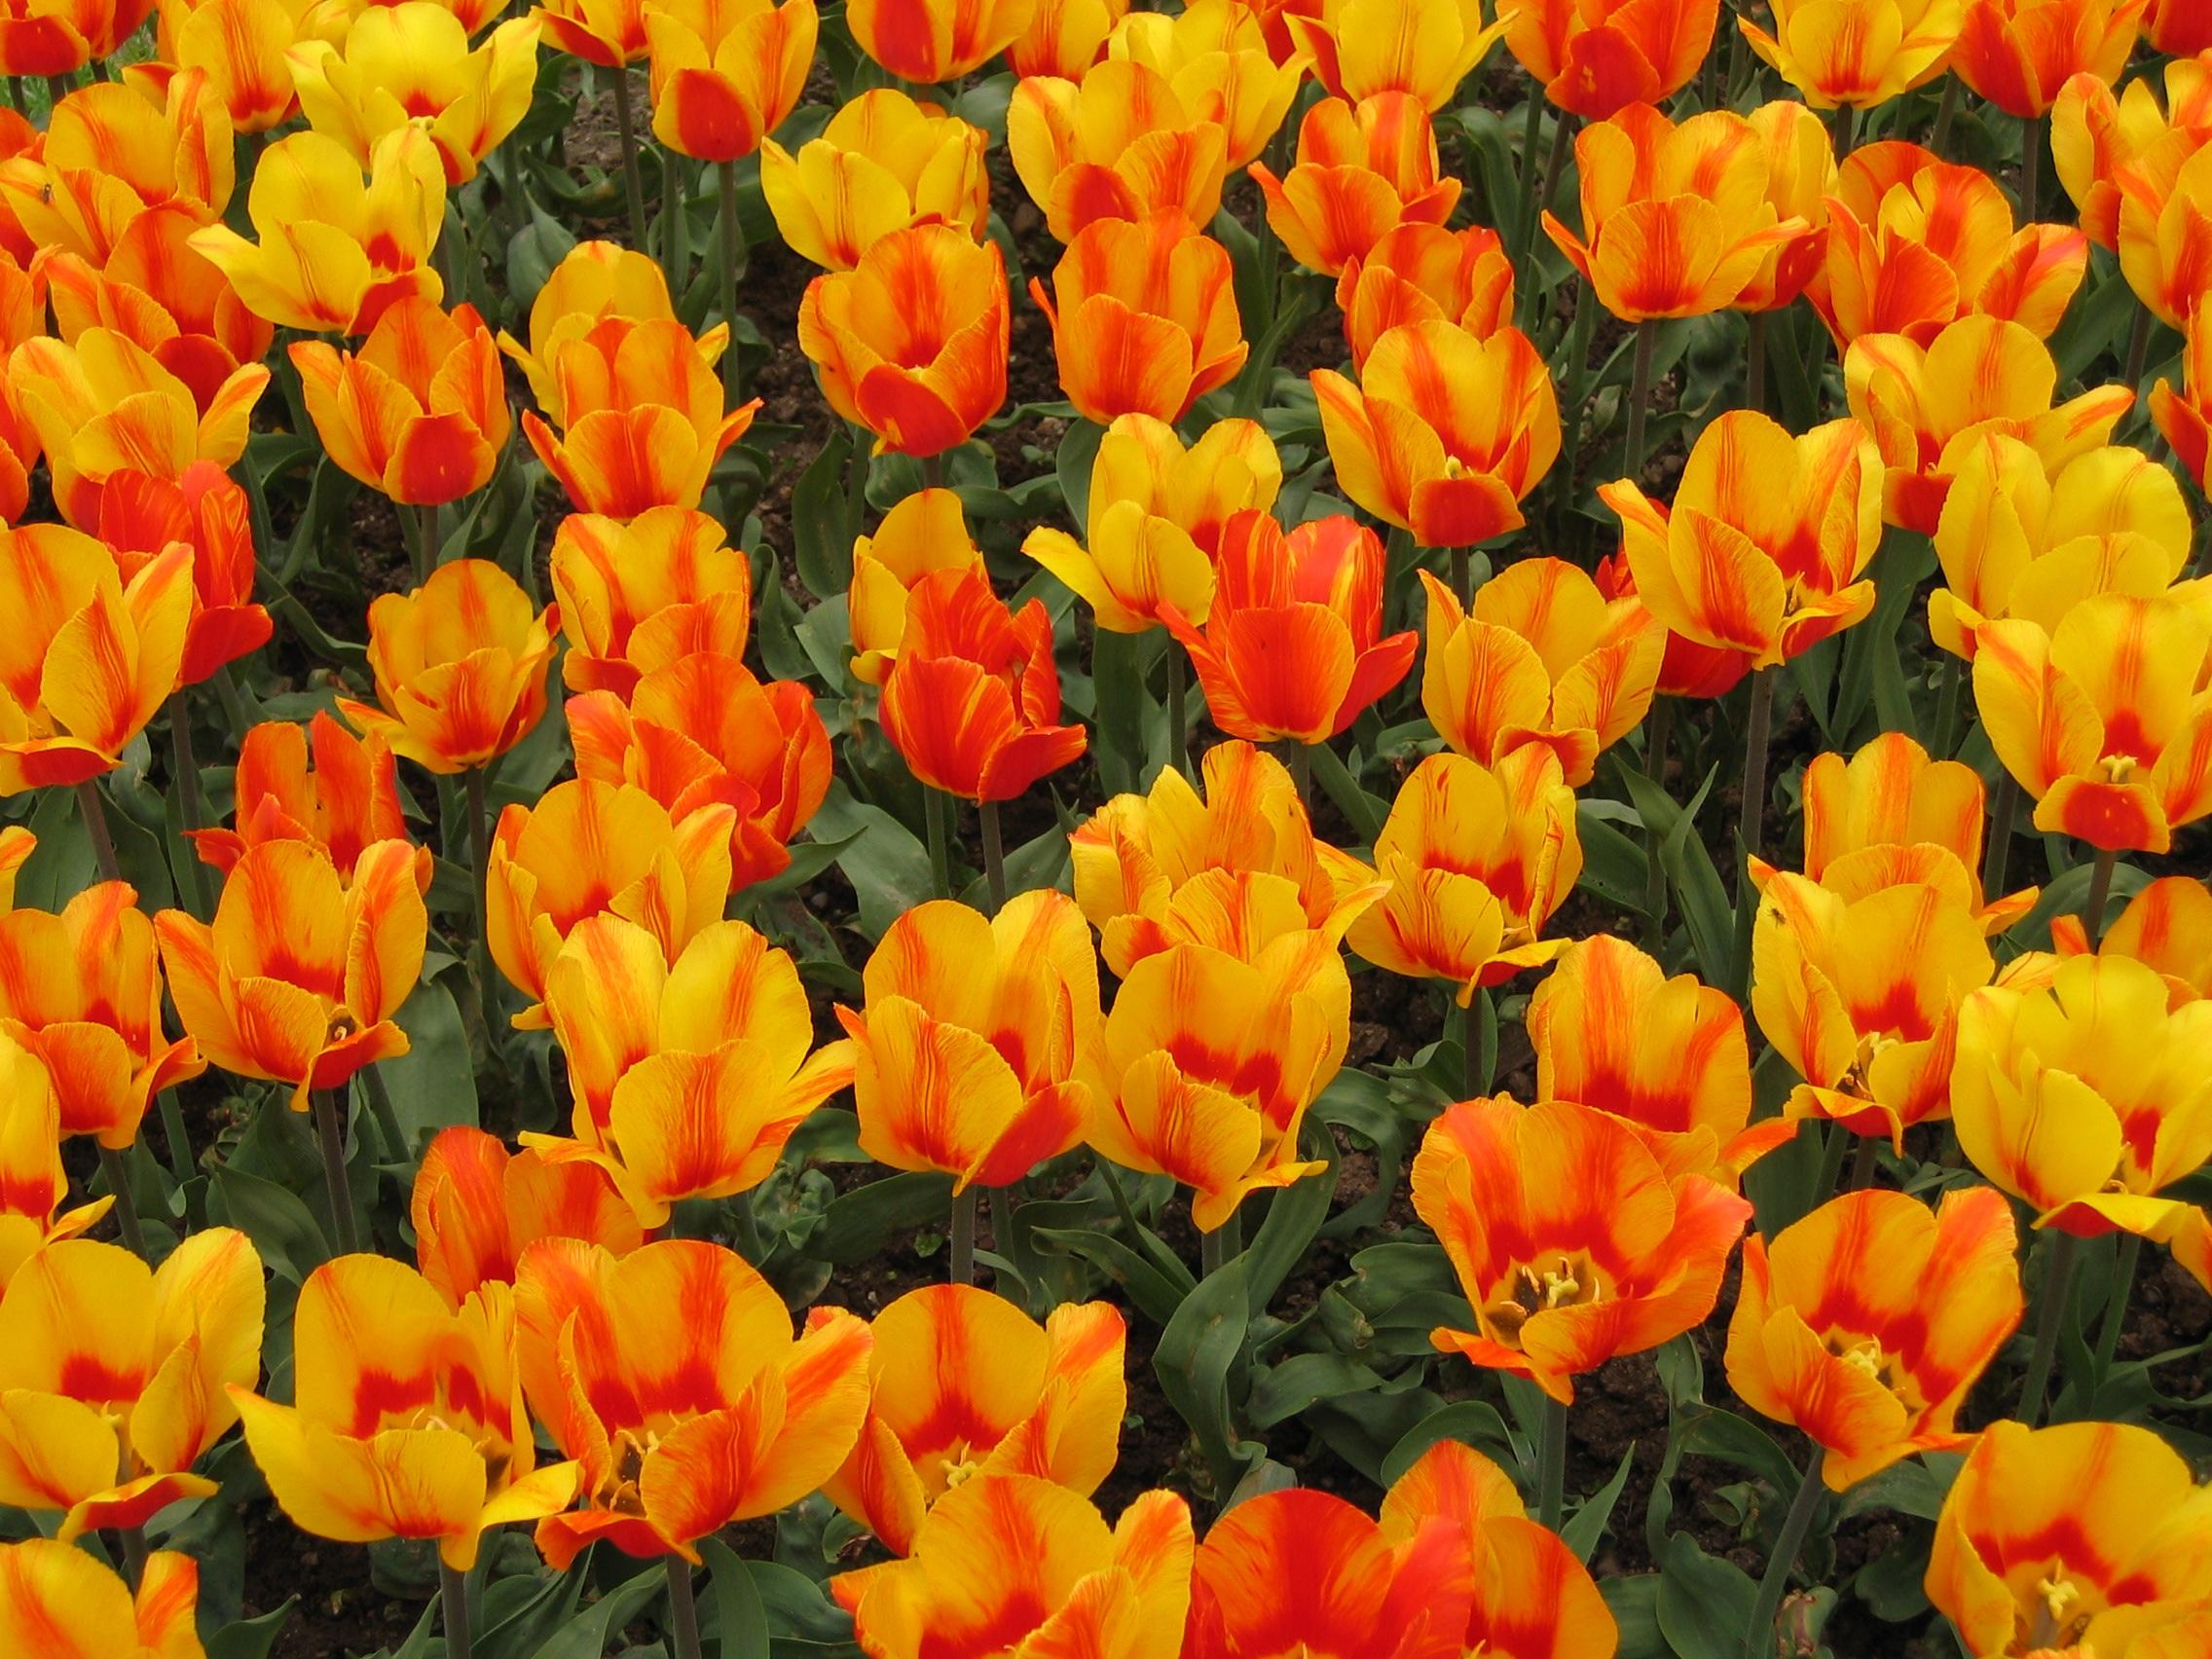 Free Images Flower Petal Tulip Spring Flowers Colors Tulips